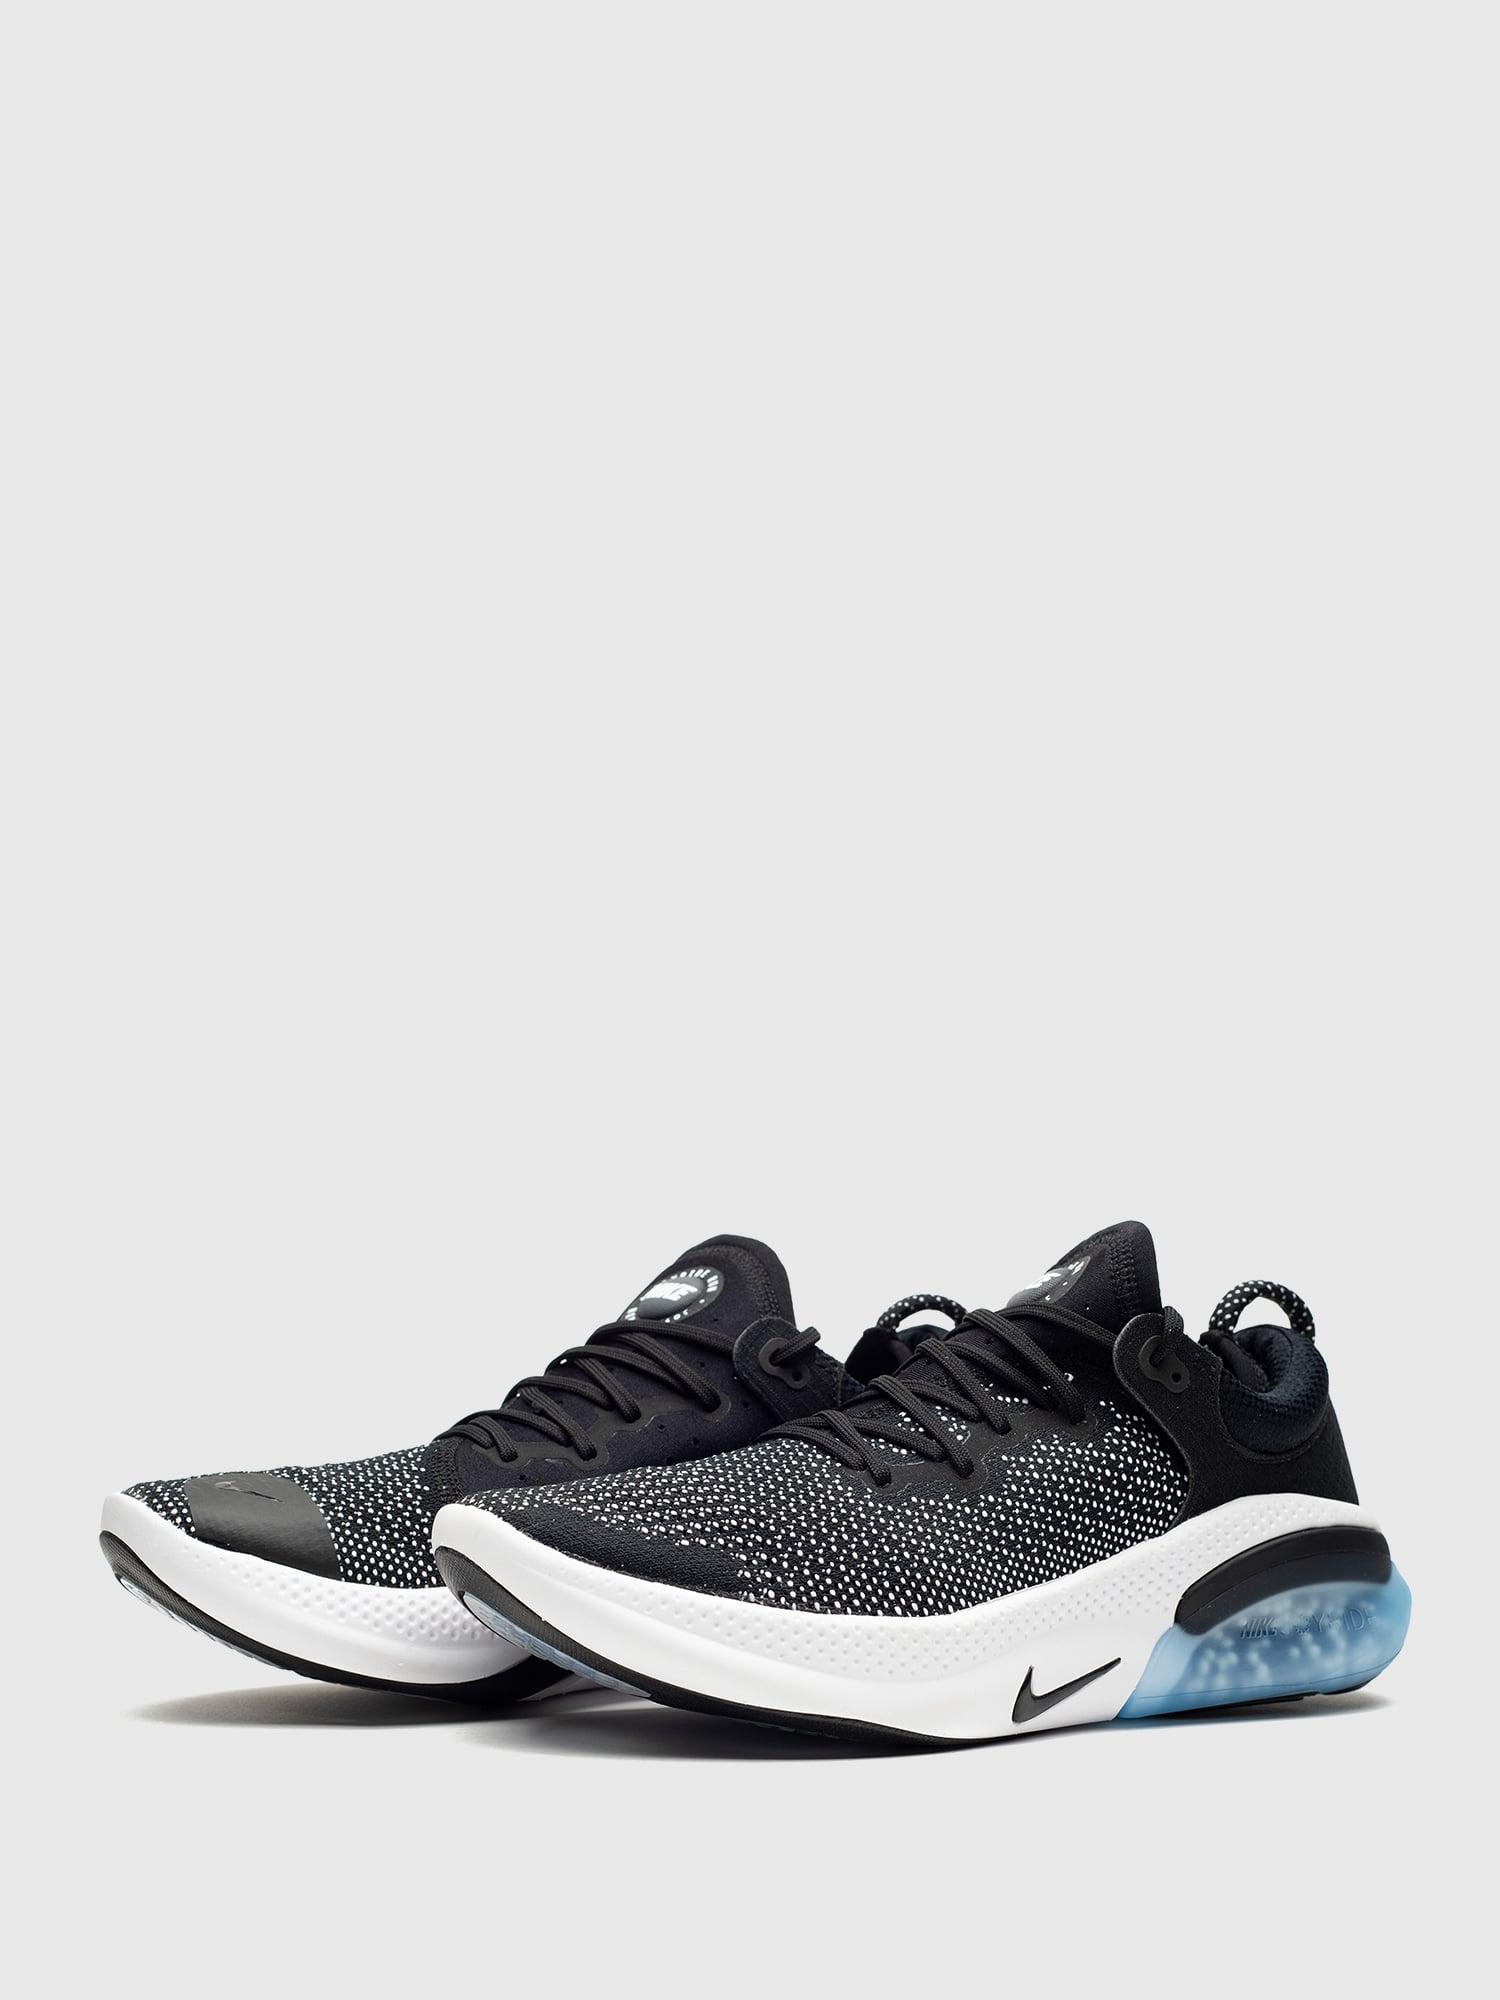 Nike Joyride Run Flyknit Black White